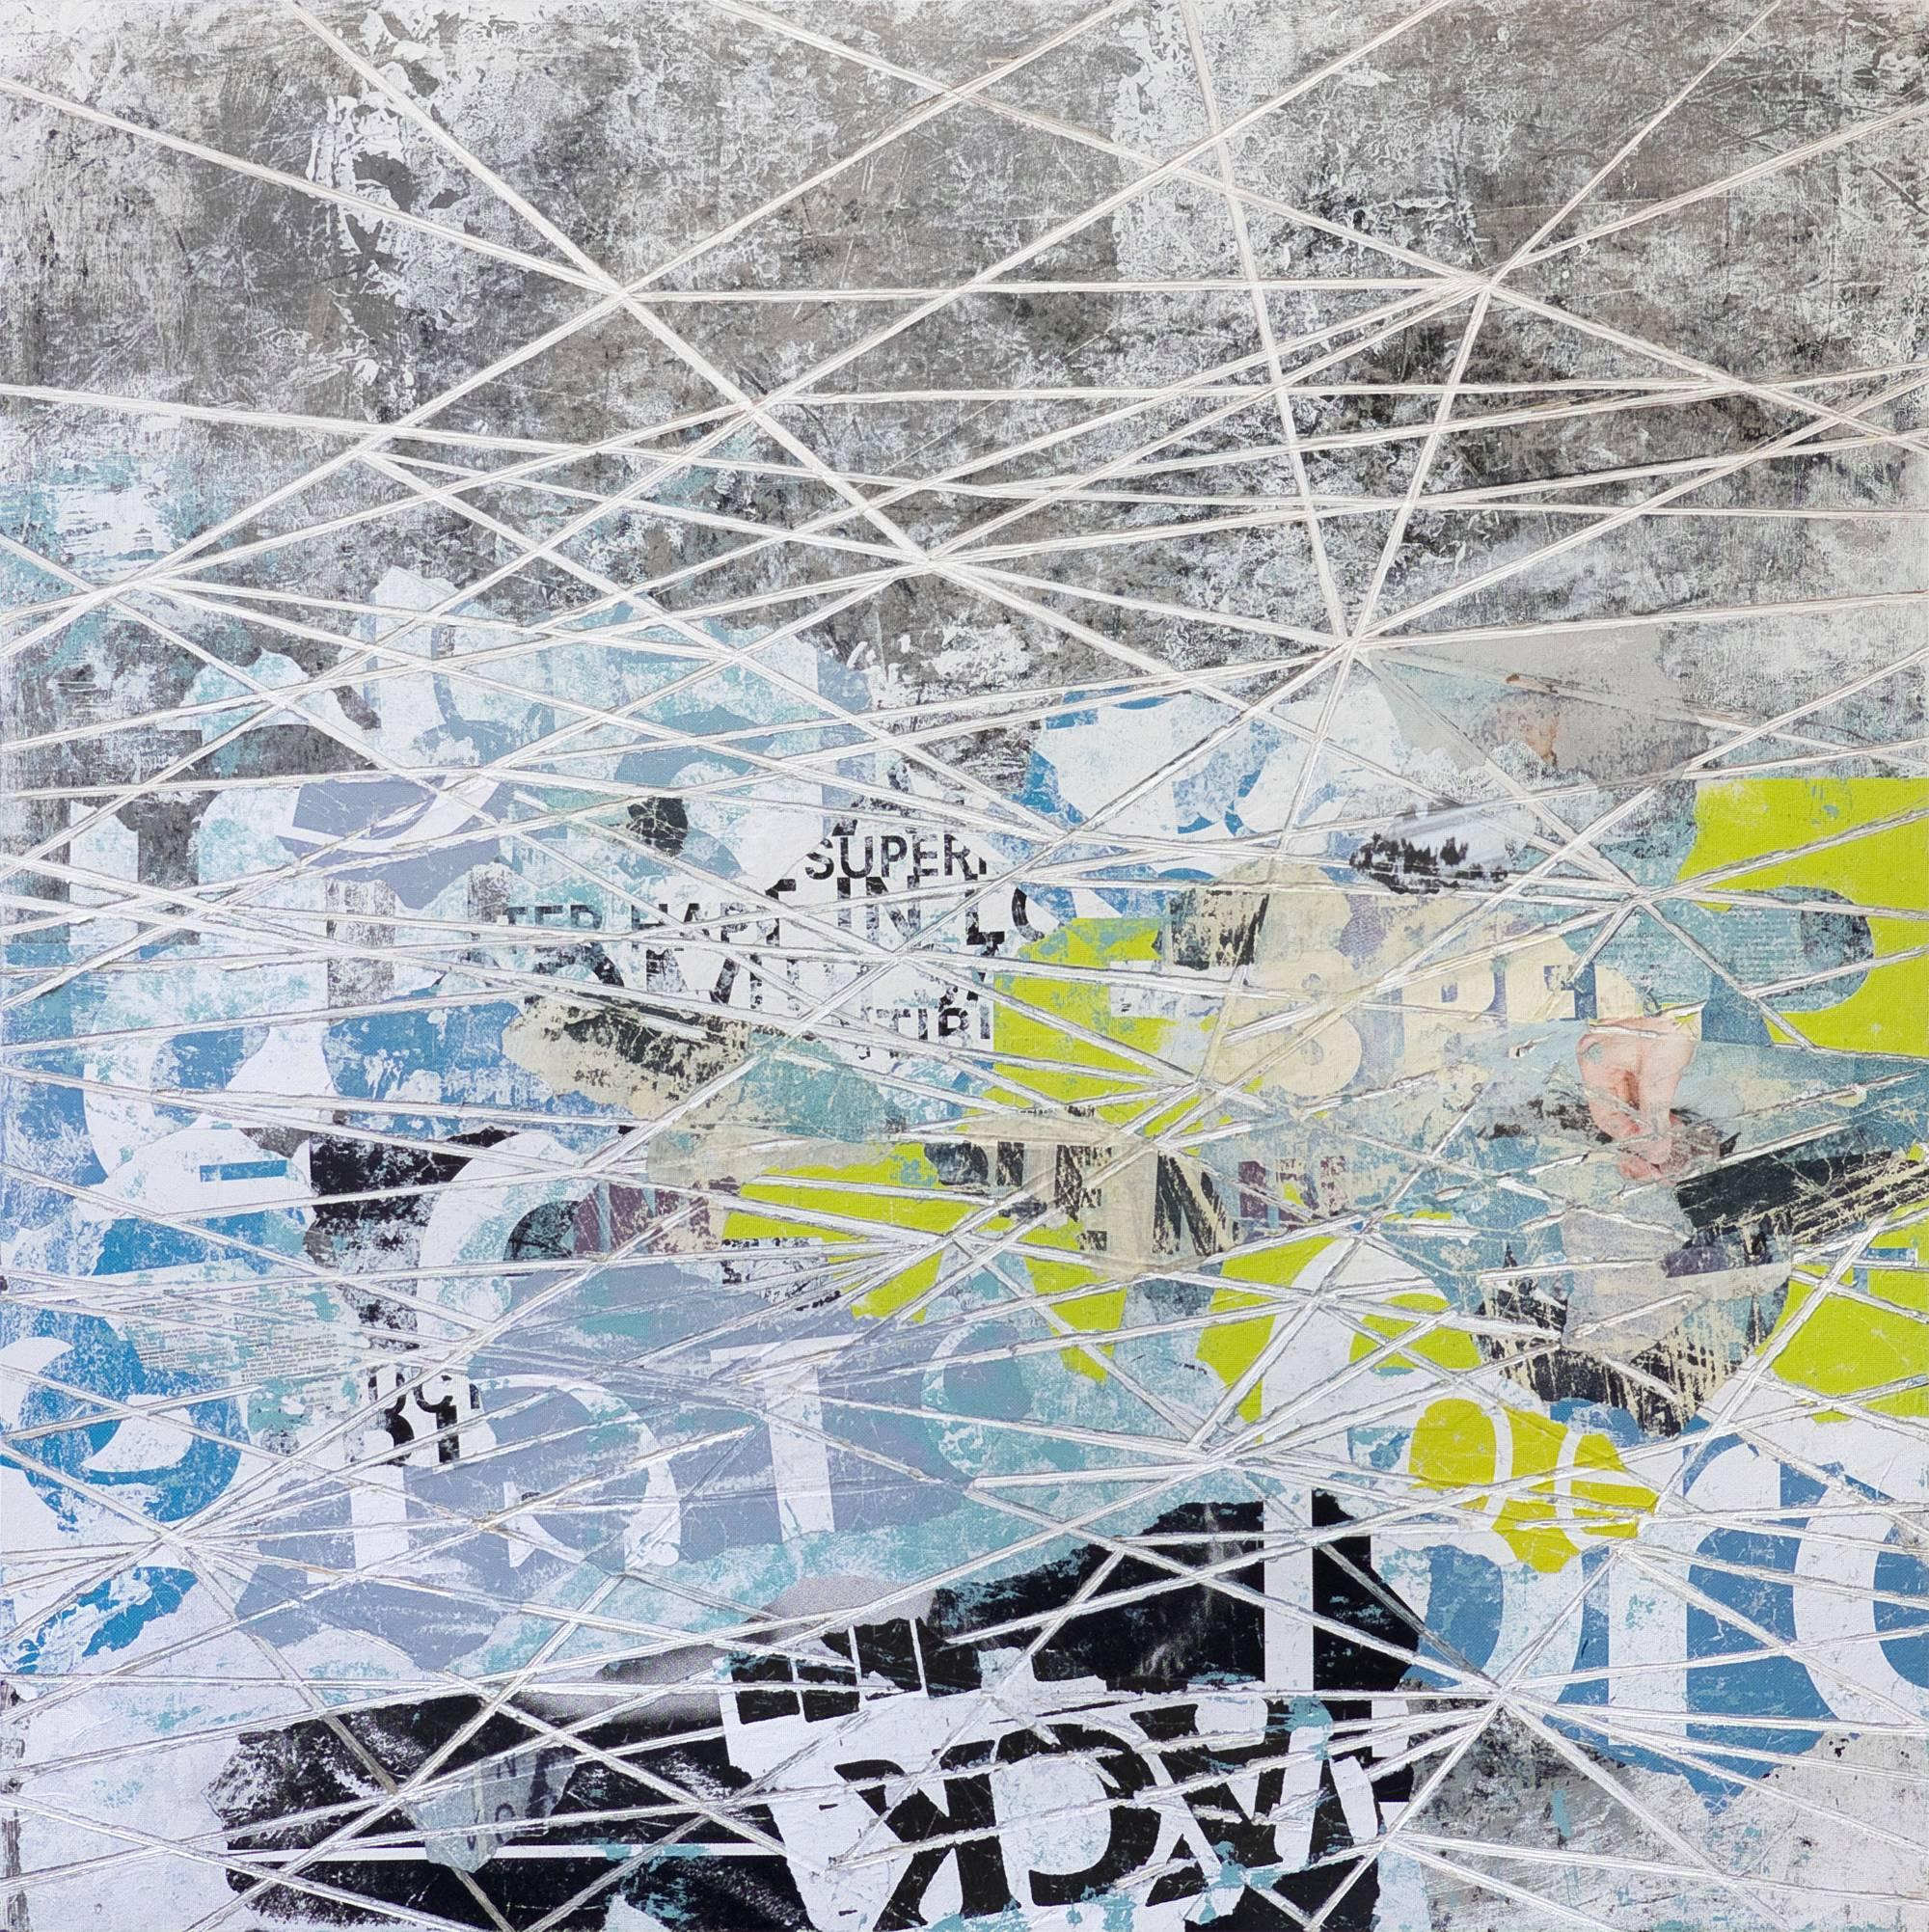 Graffiti Rose - Contemporary Abstract Geometric Street Art Painting